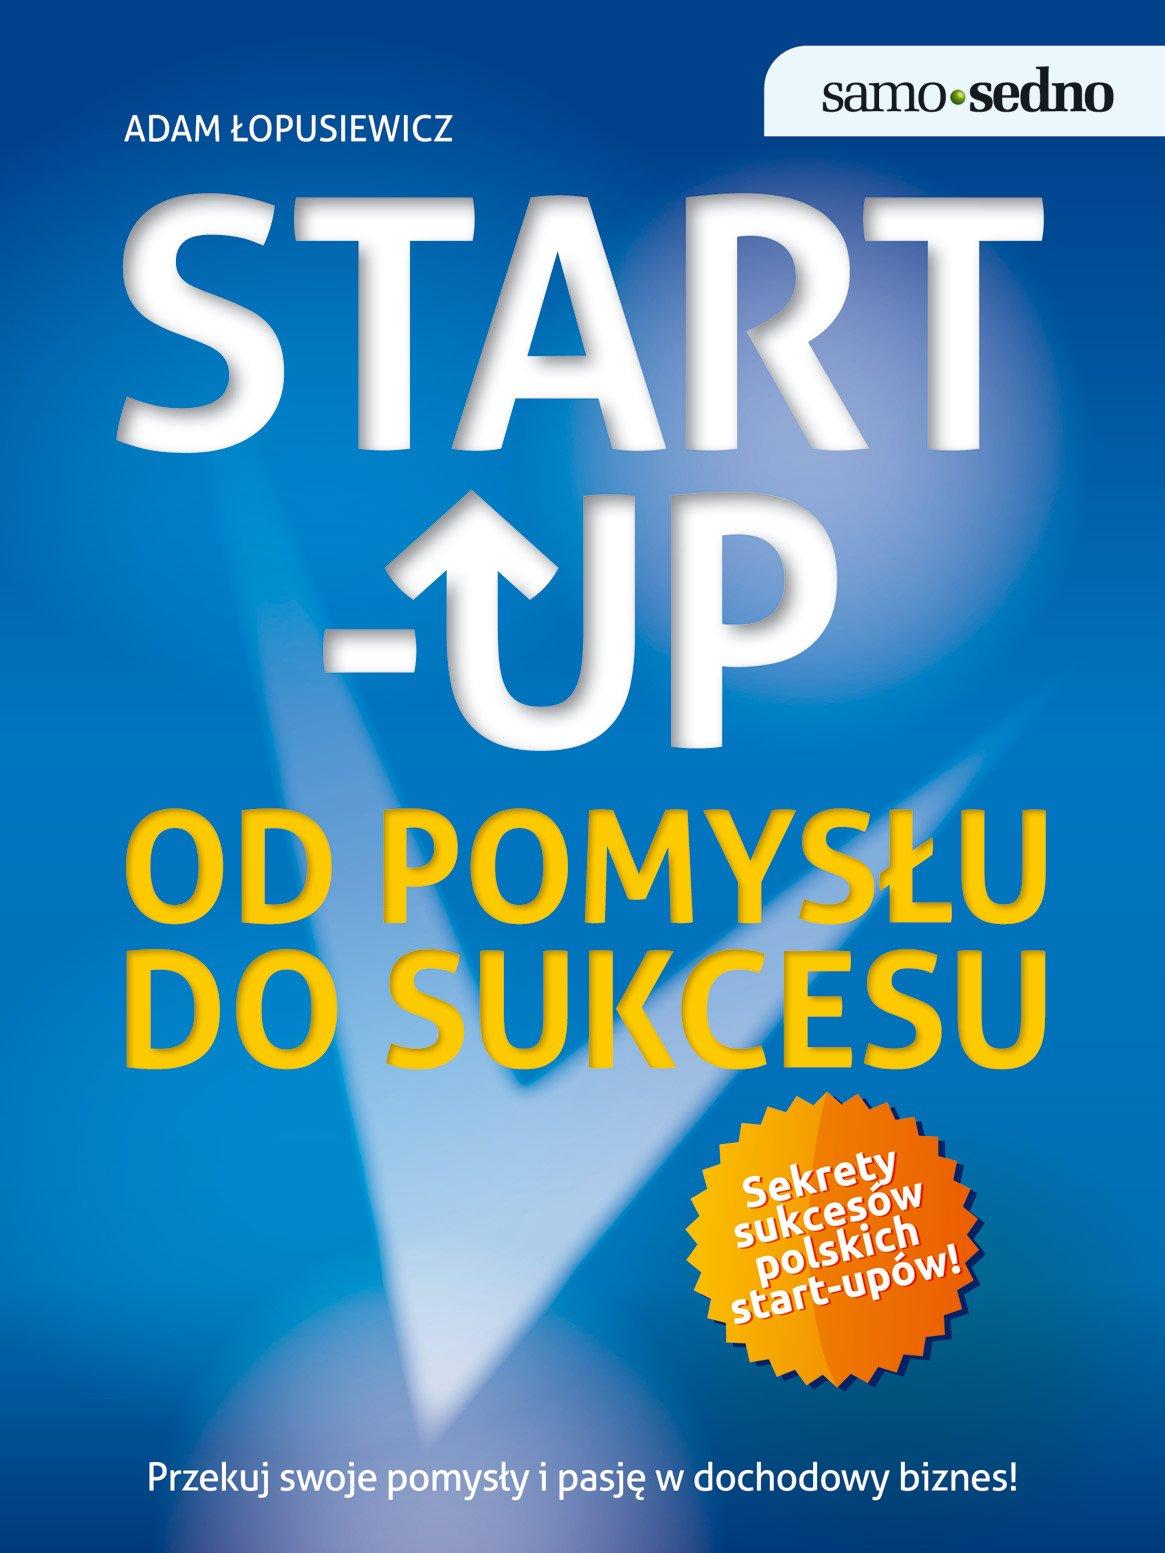 Samo Sedno. Start-up. Od pomysłu do sukcesu - Ebook (Książka EPUB) do pobrania w formacie EPUB